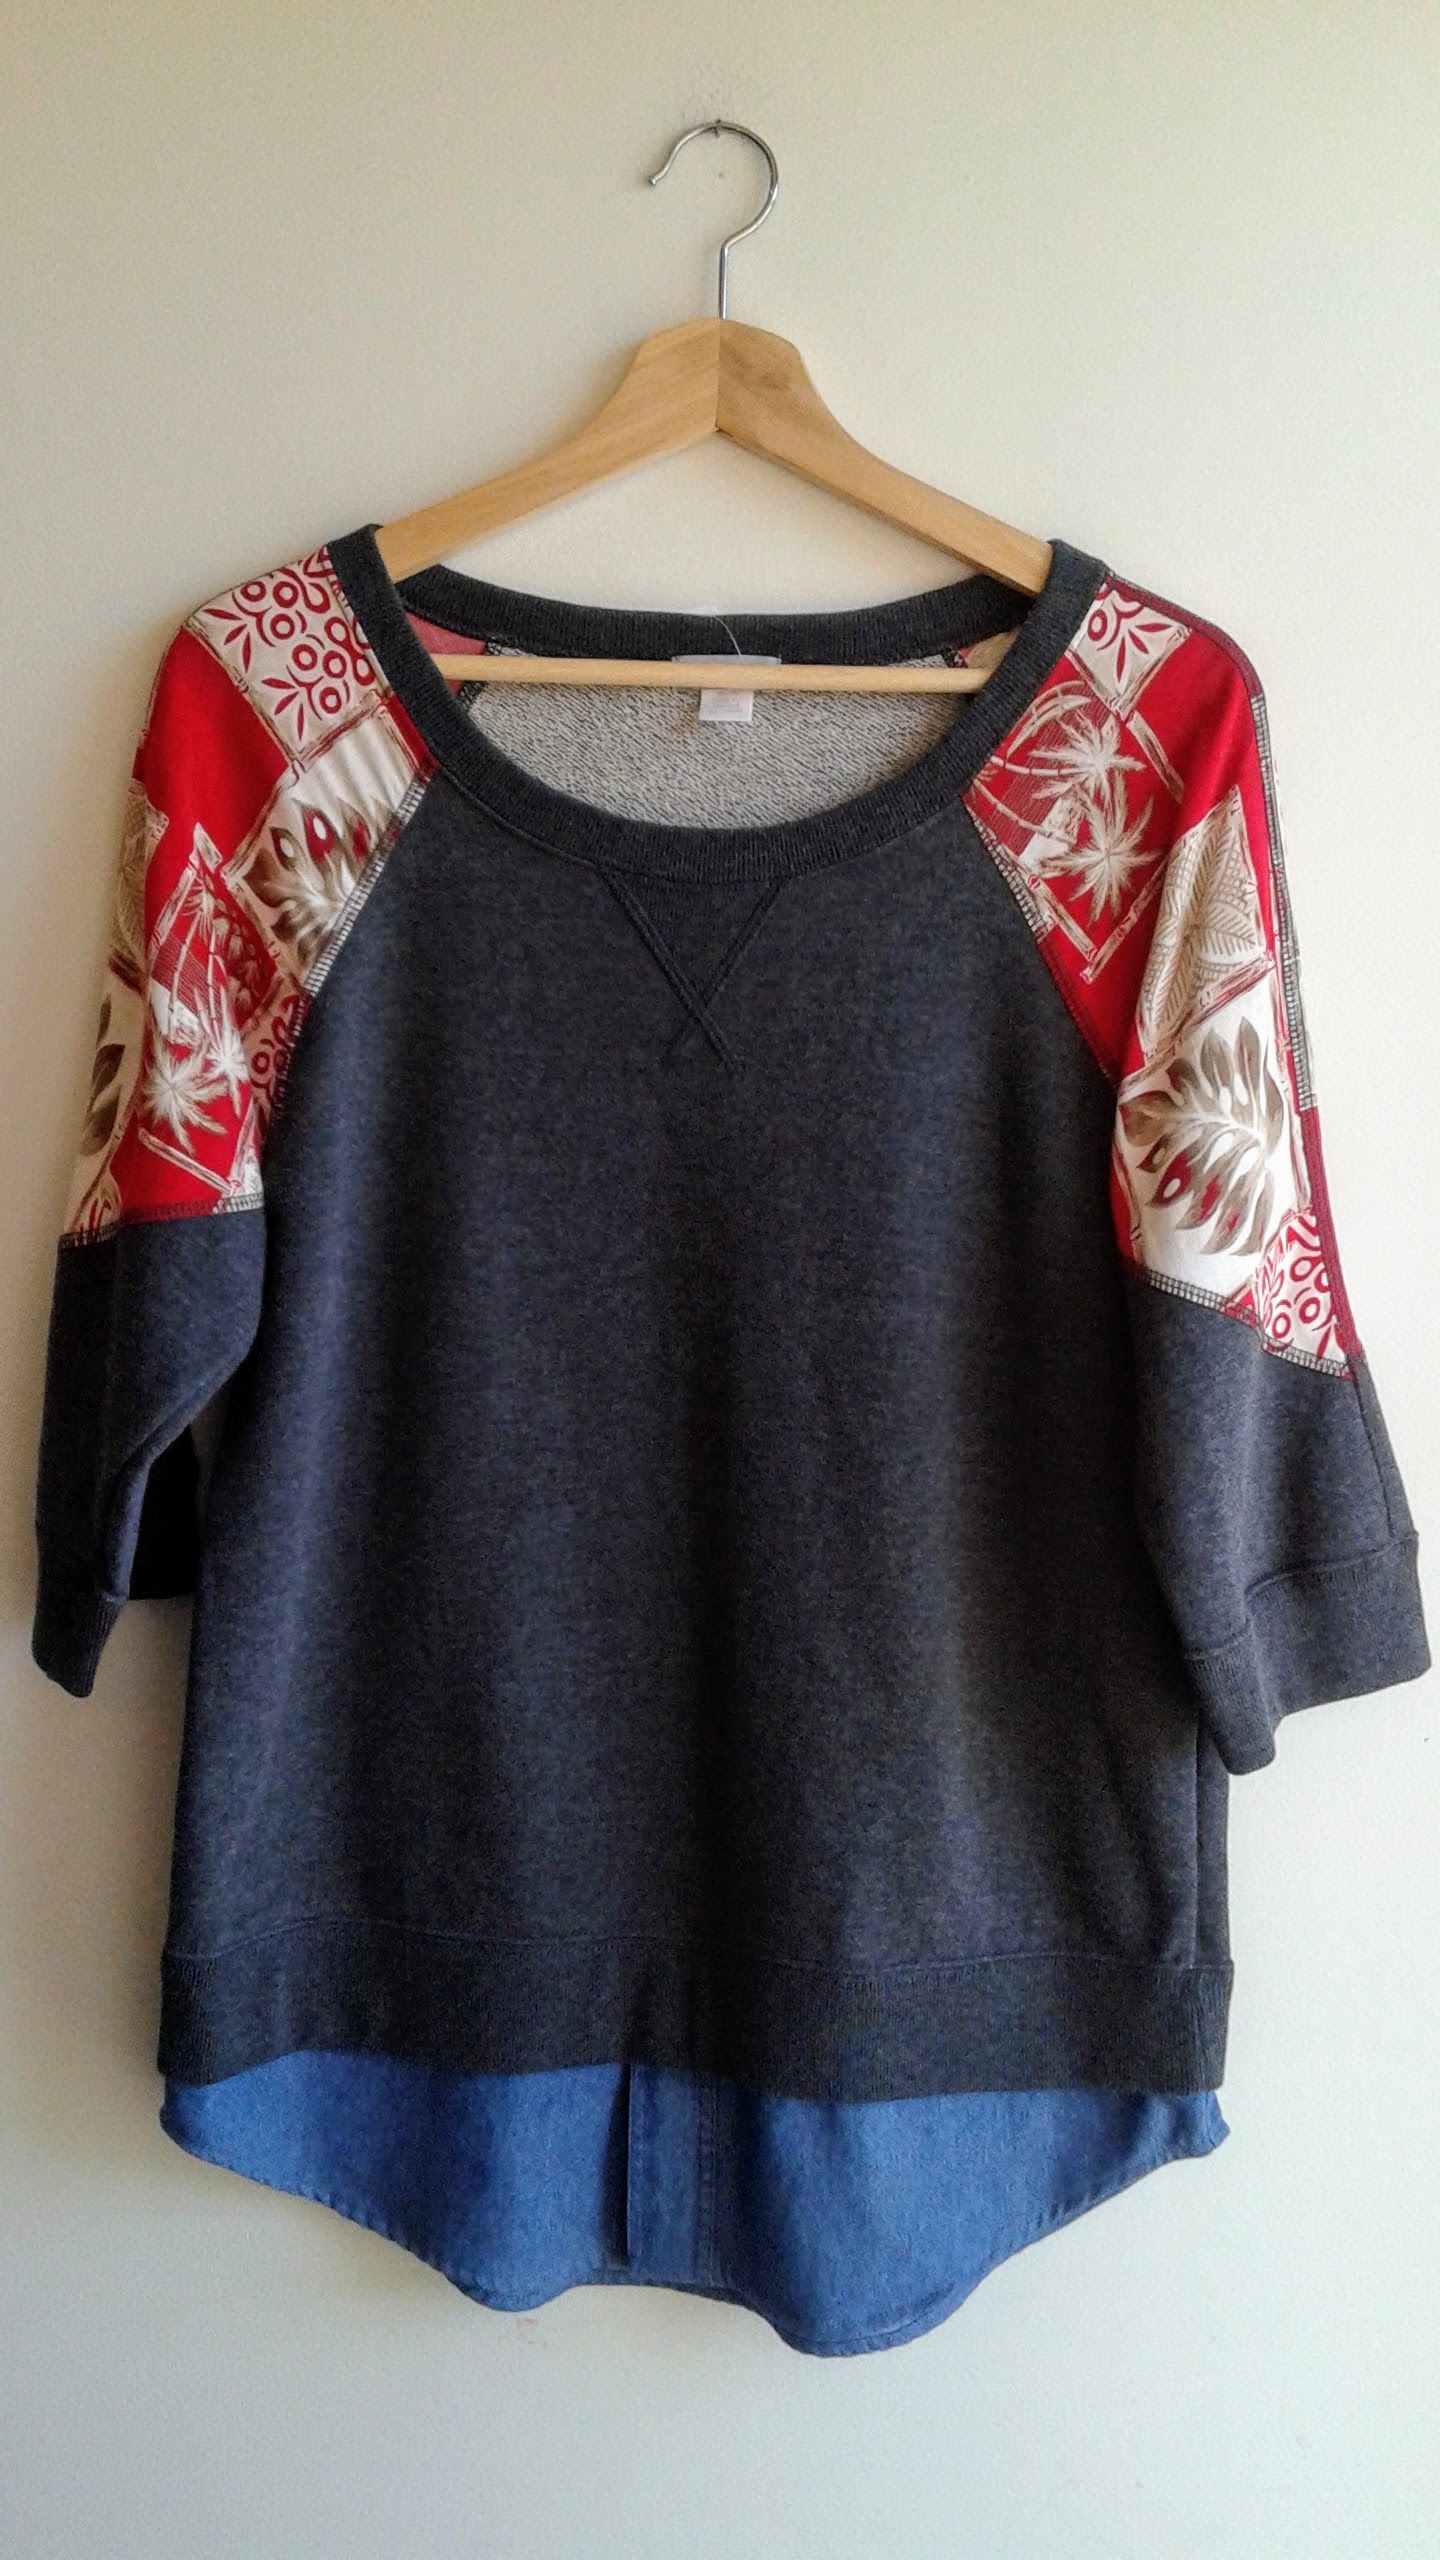 Preloved top; Size M, $32